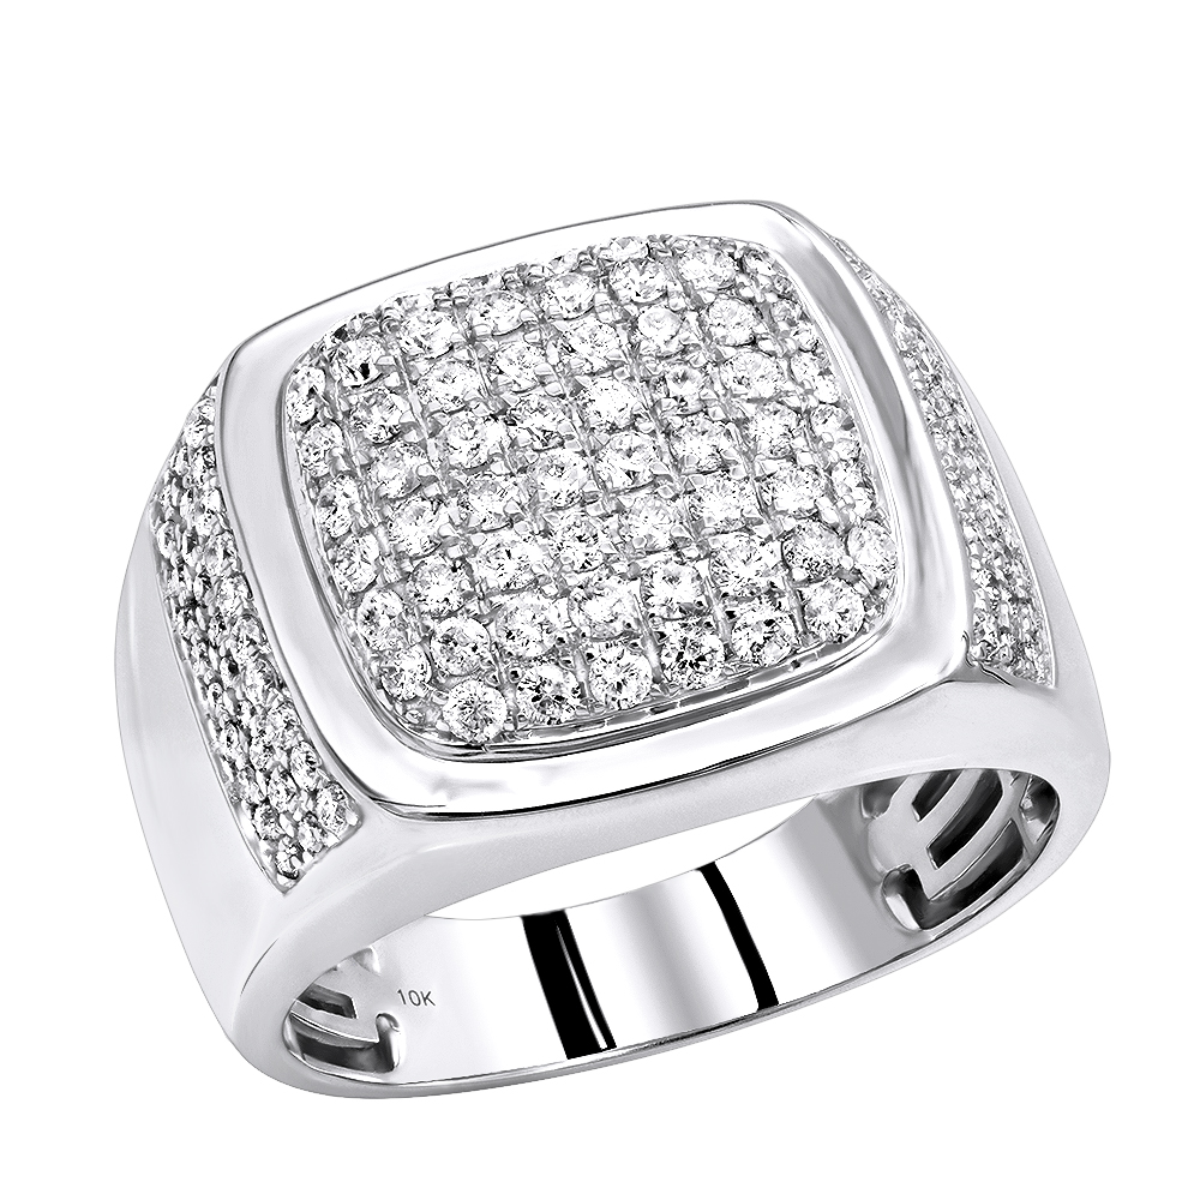 Luxurman Mens Diamond Rings 10k Gold Unique Diamond Wedding Band 1.5 Carat